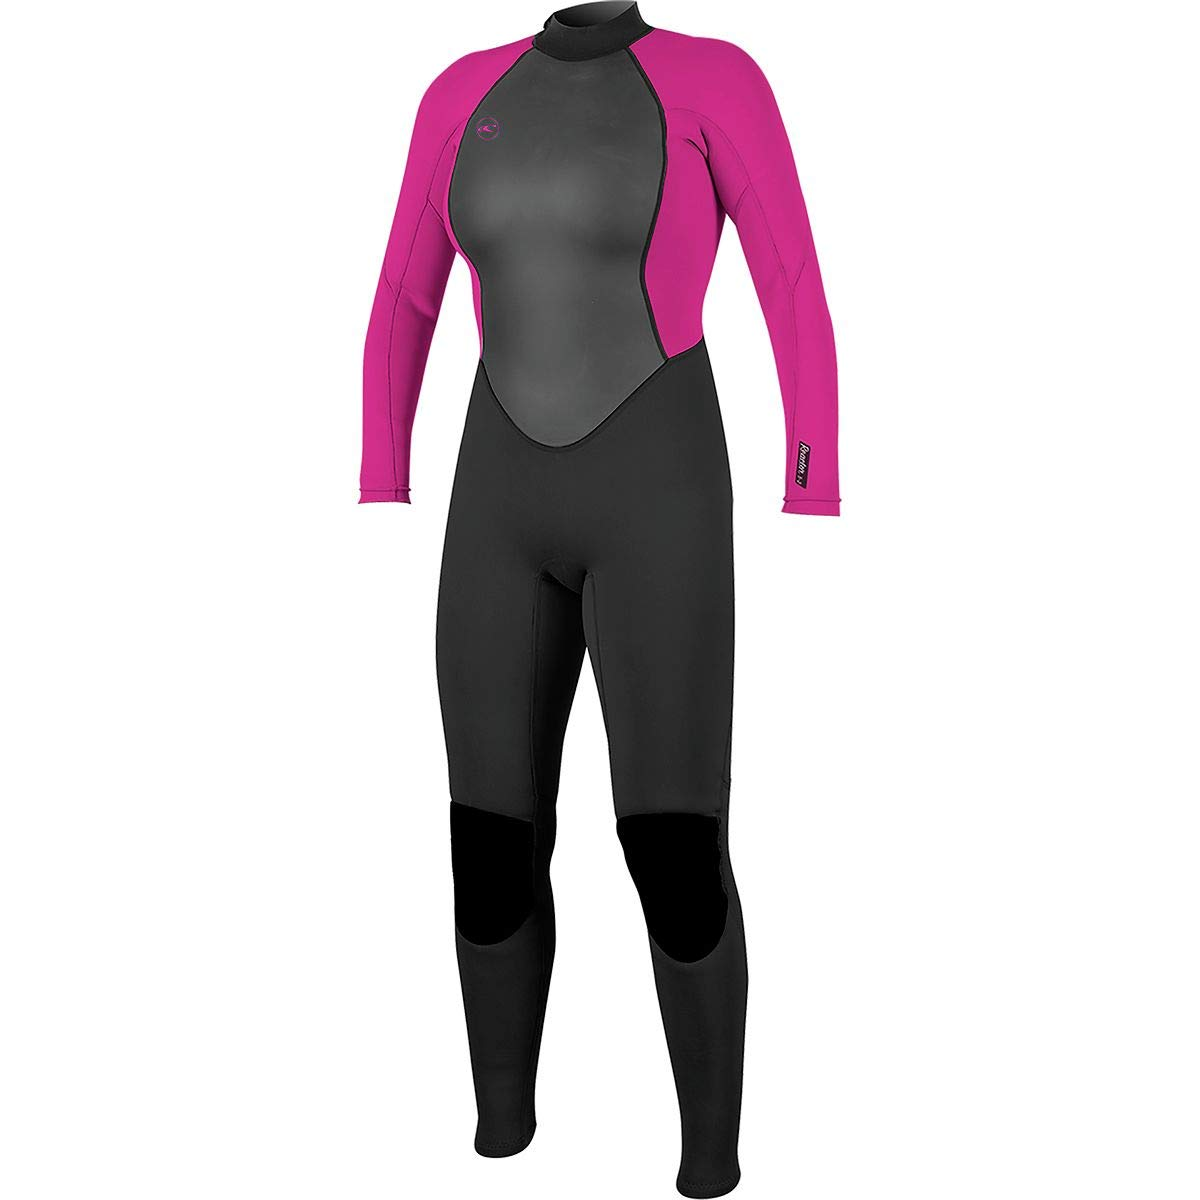 O'Neill Women's Reactor-2 3/2mm Back Zip Full Wetsuit, Black/Berry, 4